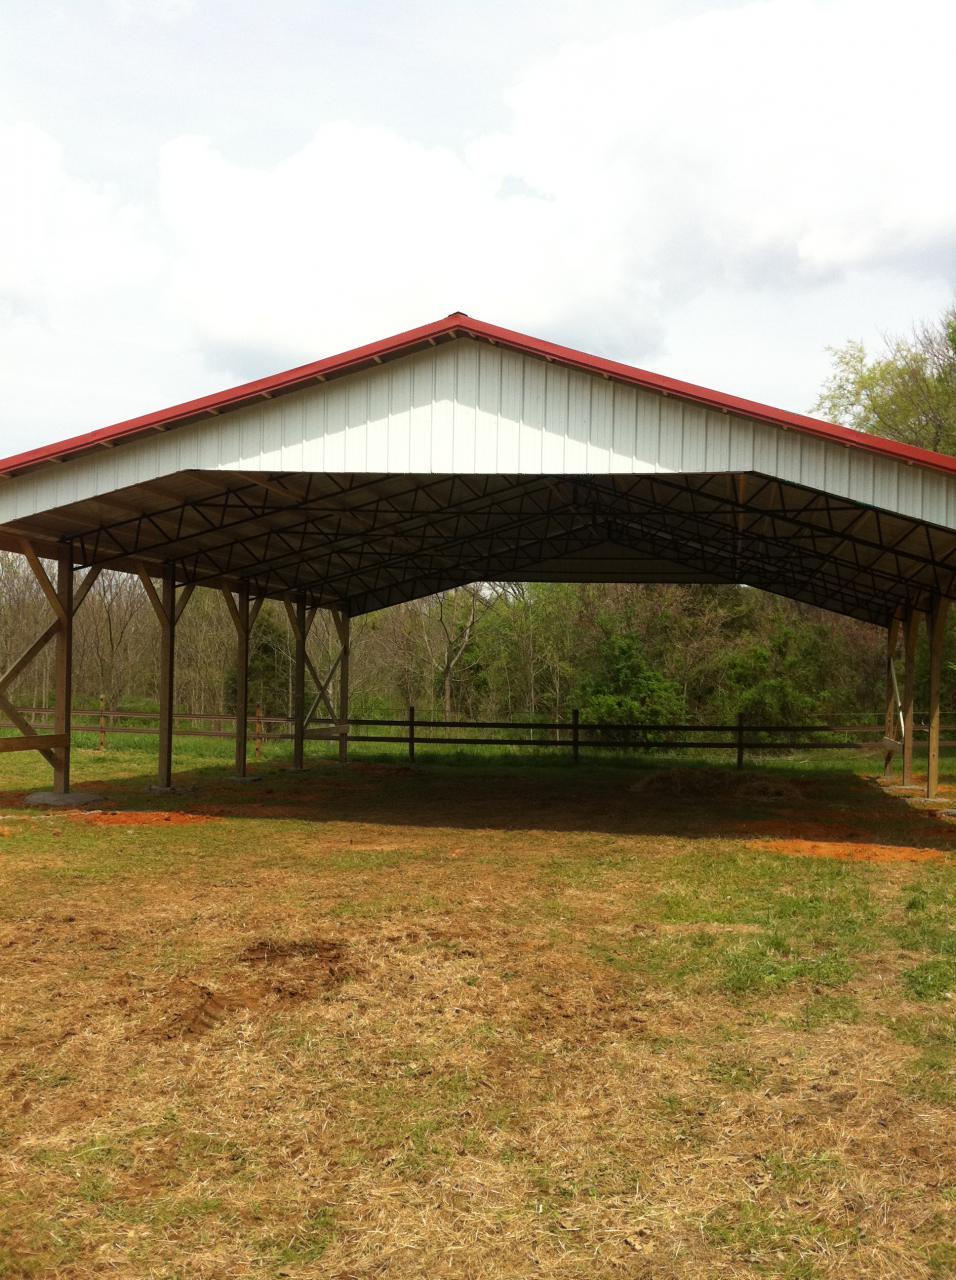 40 x 60 Pole Barn | DIY Instructions - Pro Barn Plans